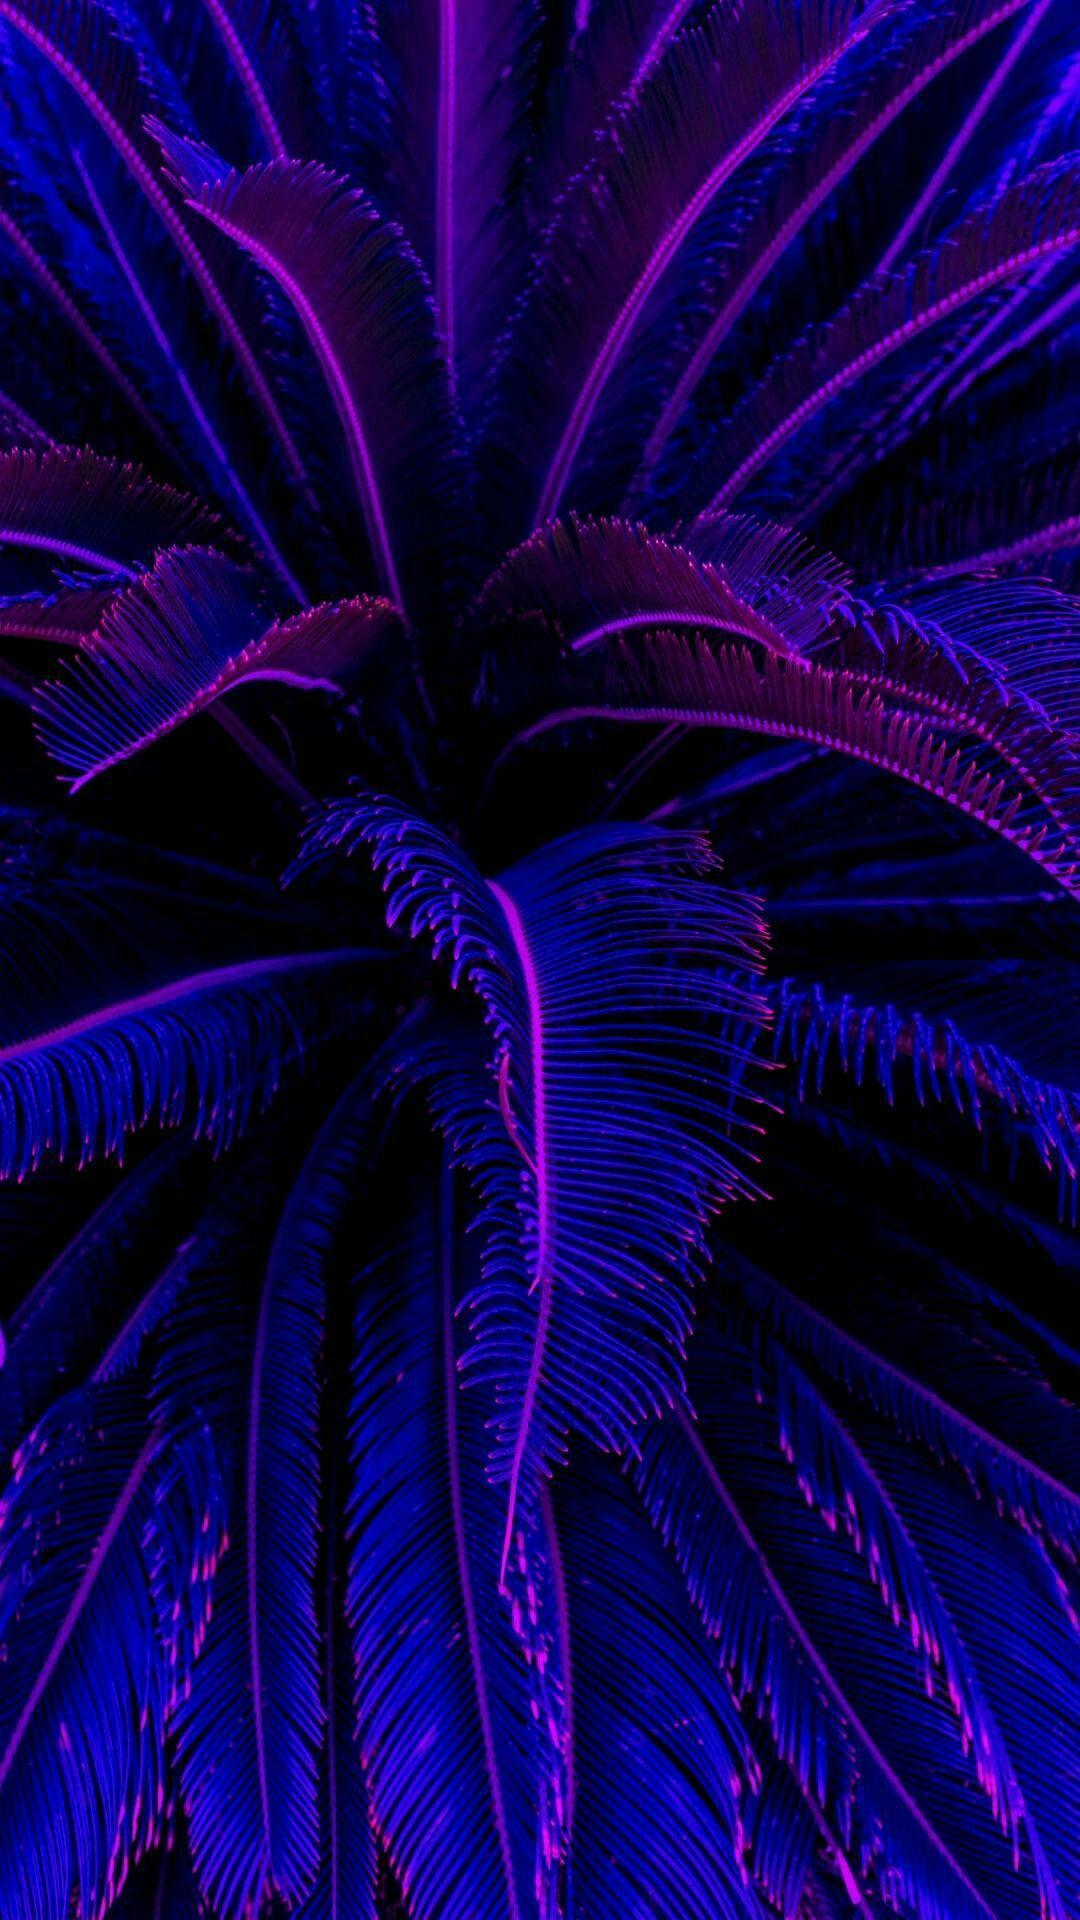 Purple Aesthetic Wallpapers - Wallpaper Cave